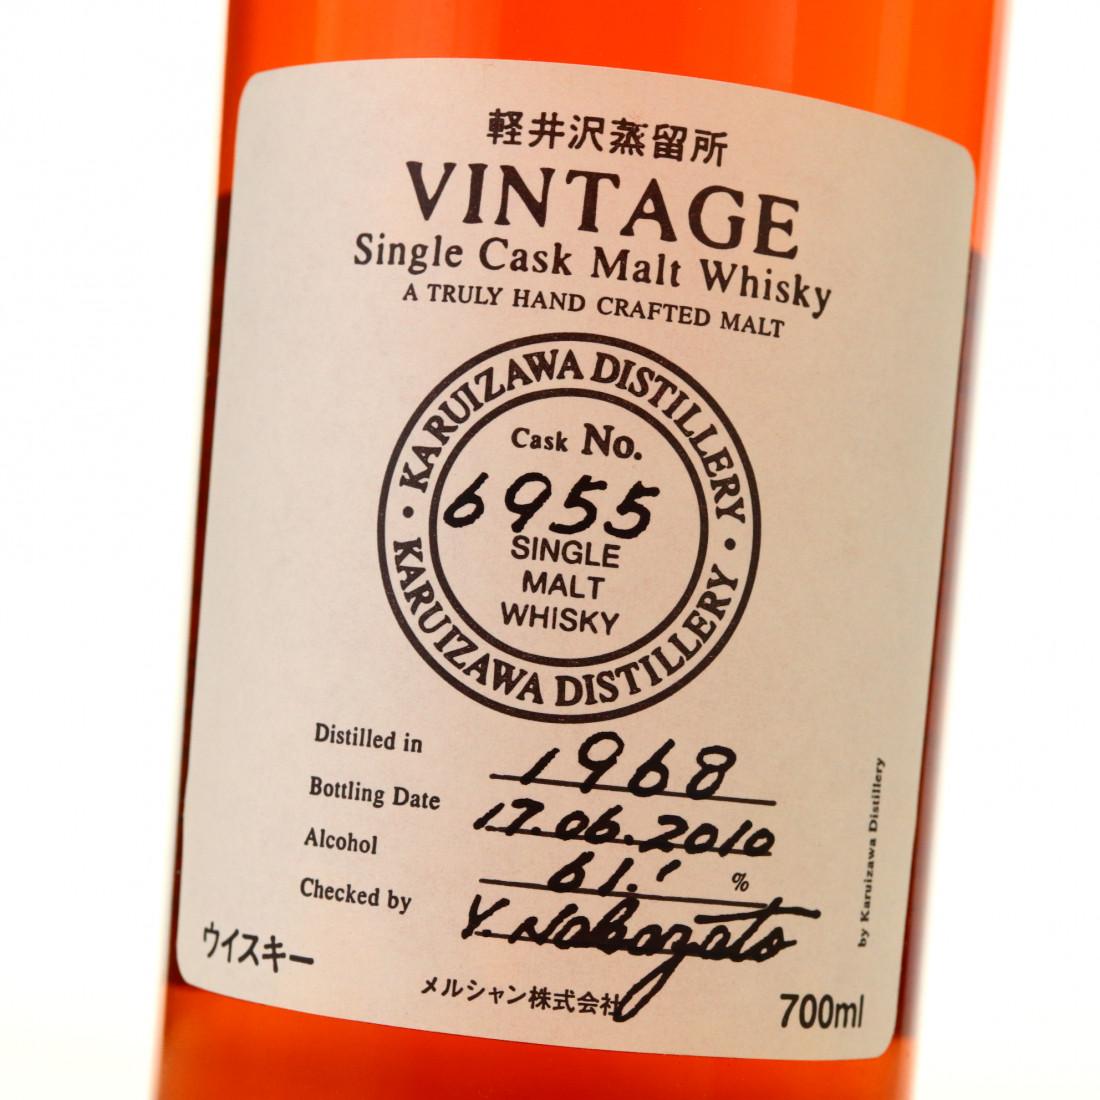 Karuizawa 1968 Single Cask #6955 / LMDW